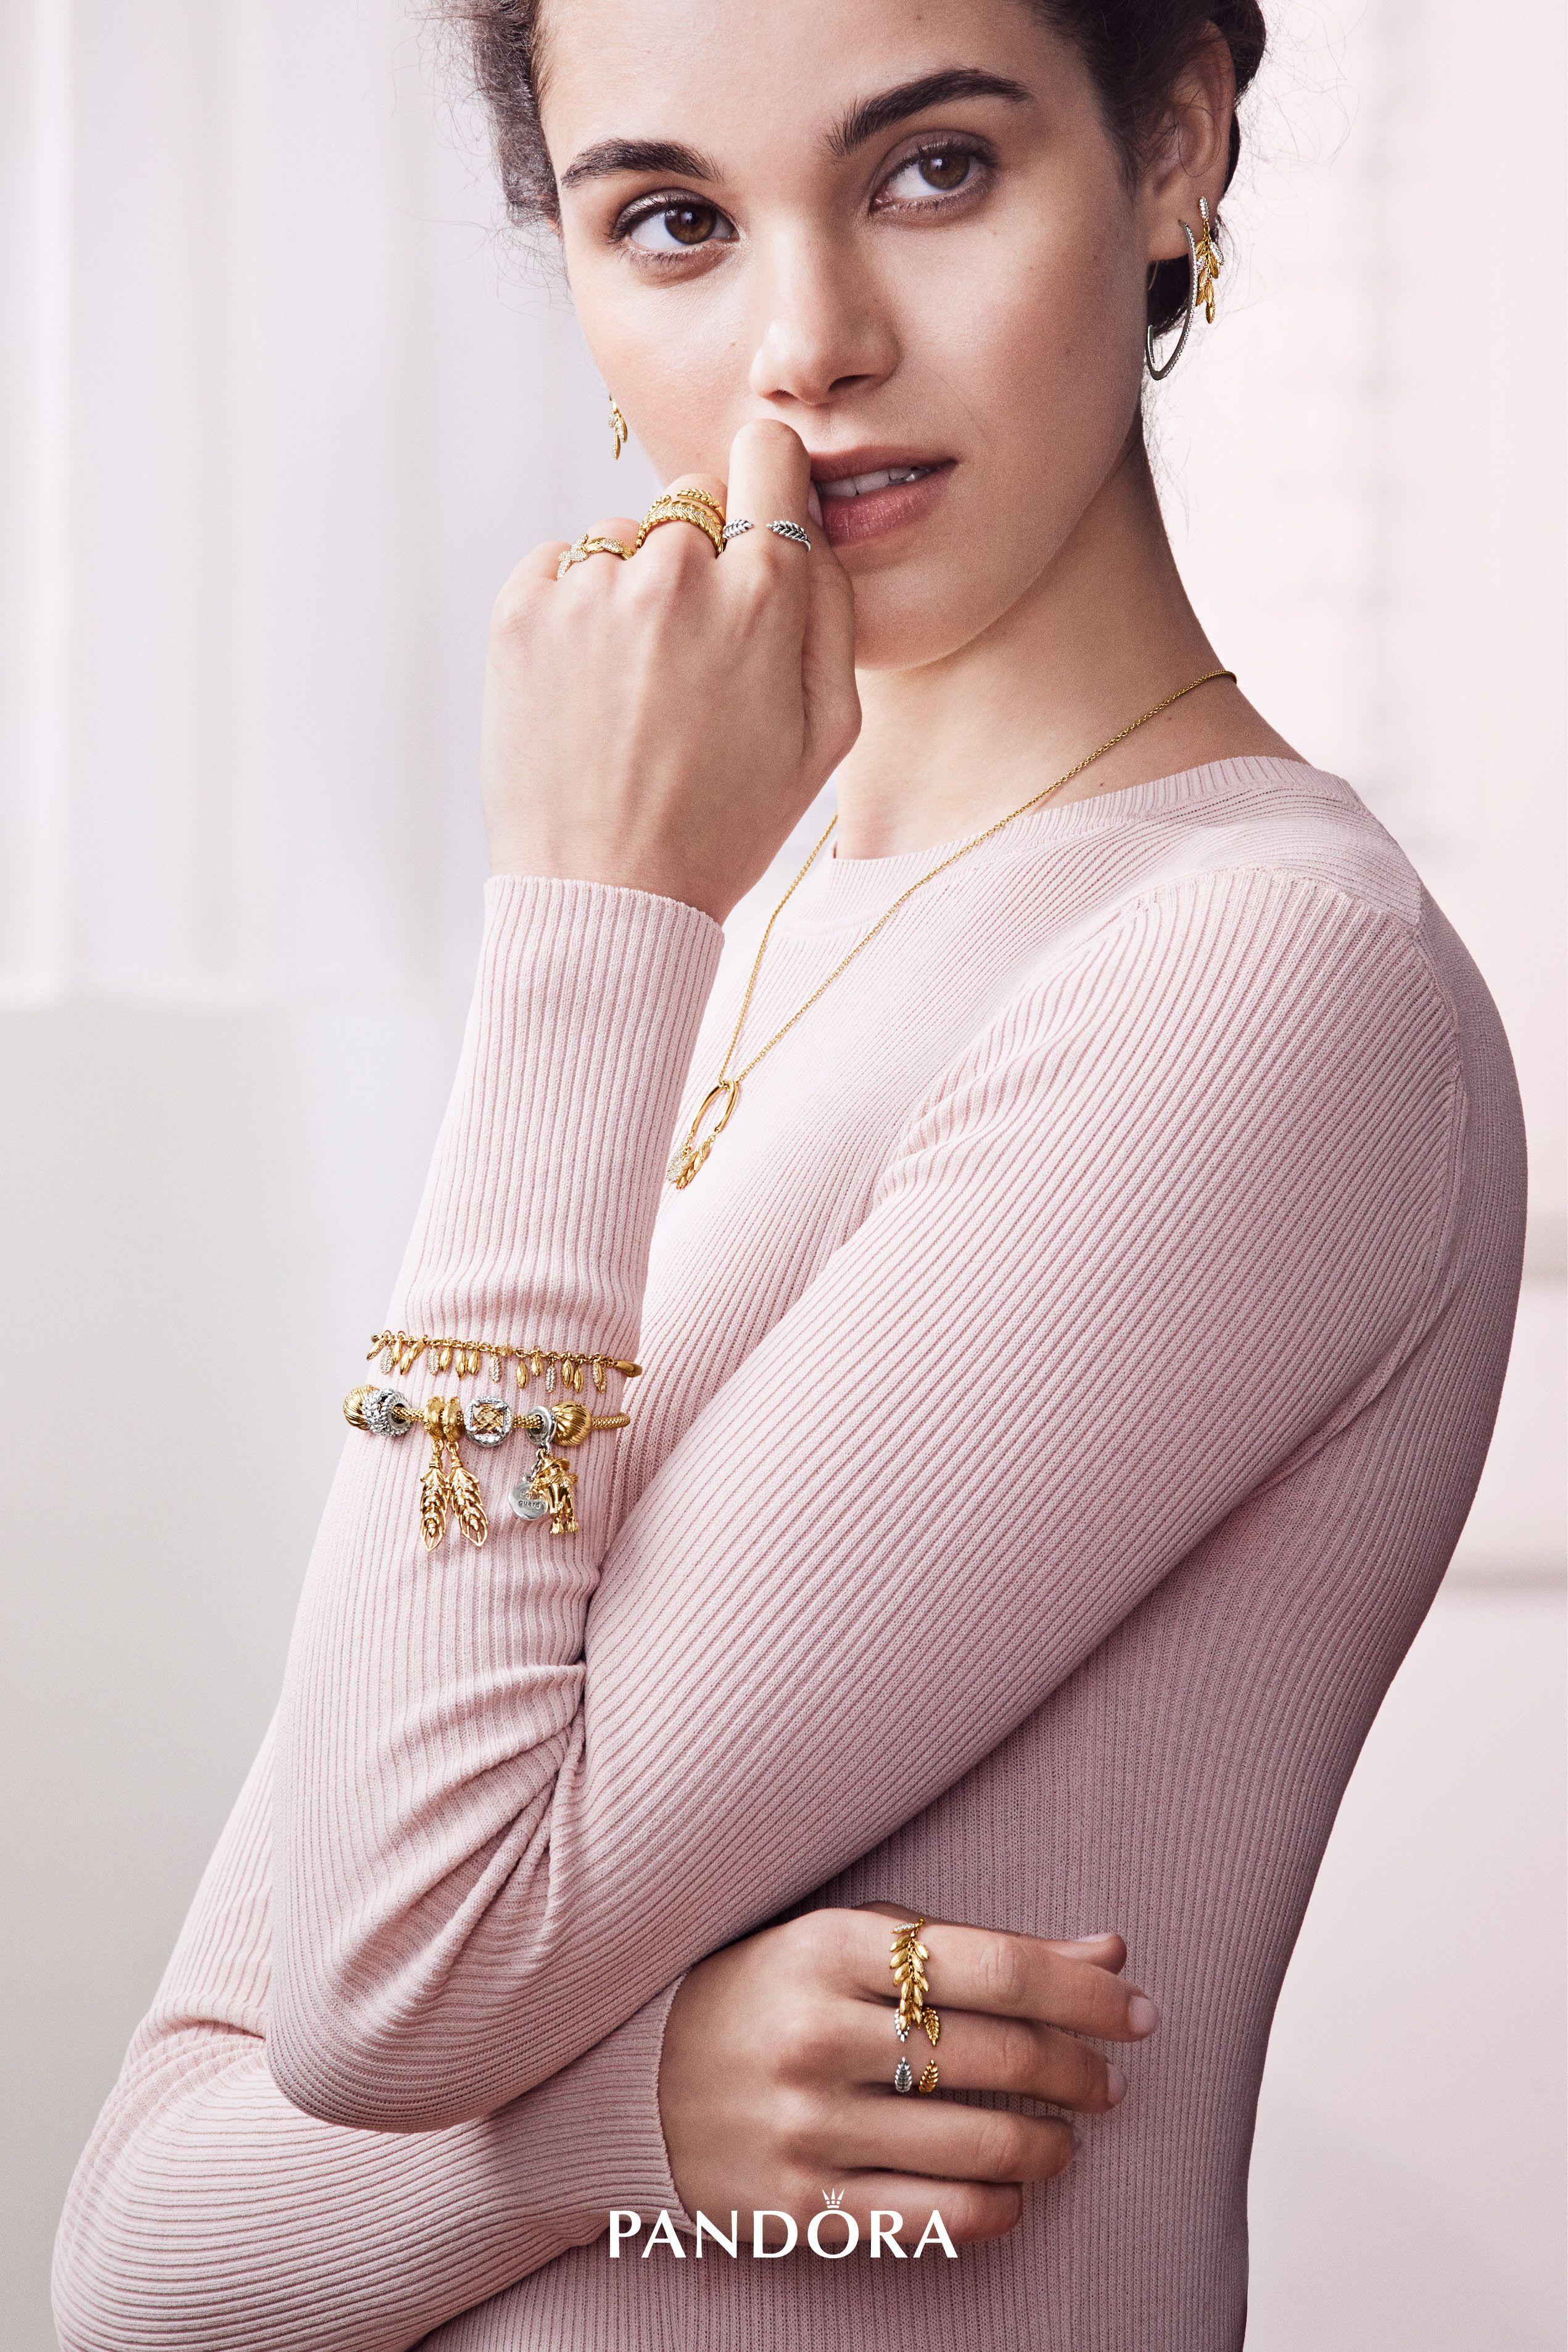 pandora bracelet charms price south africa